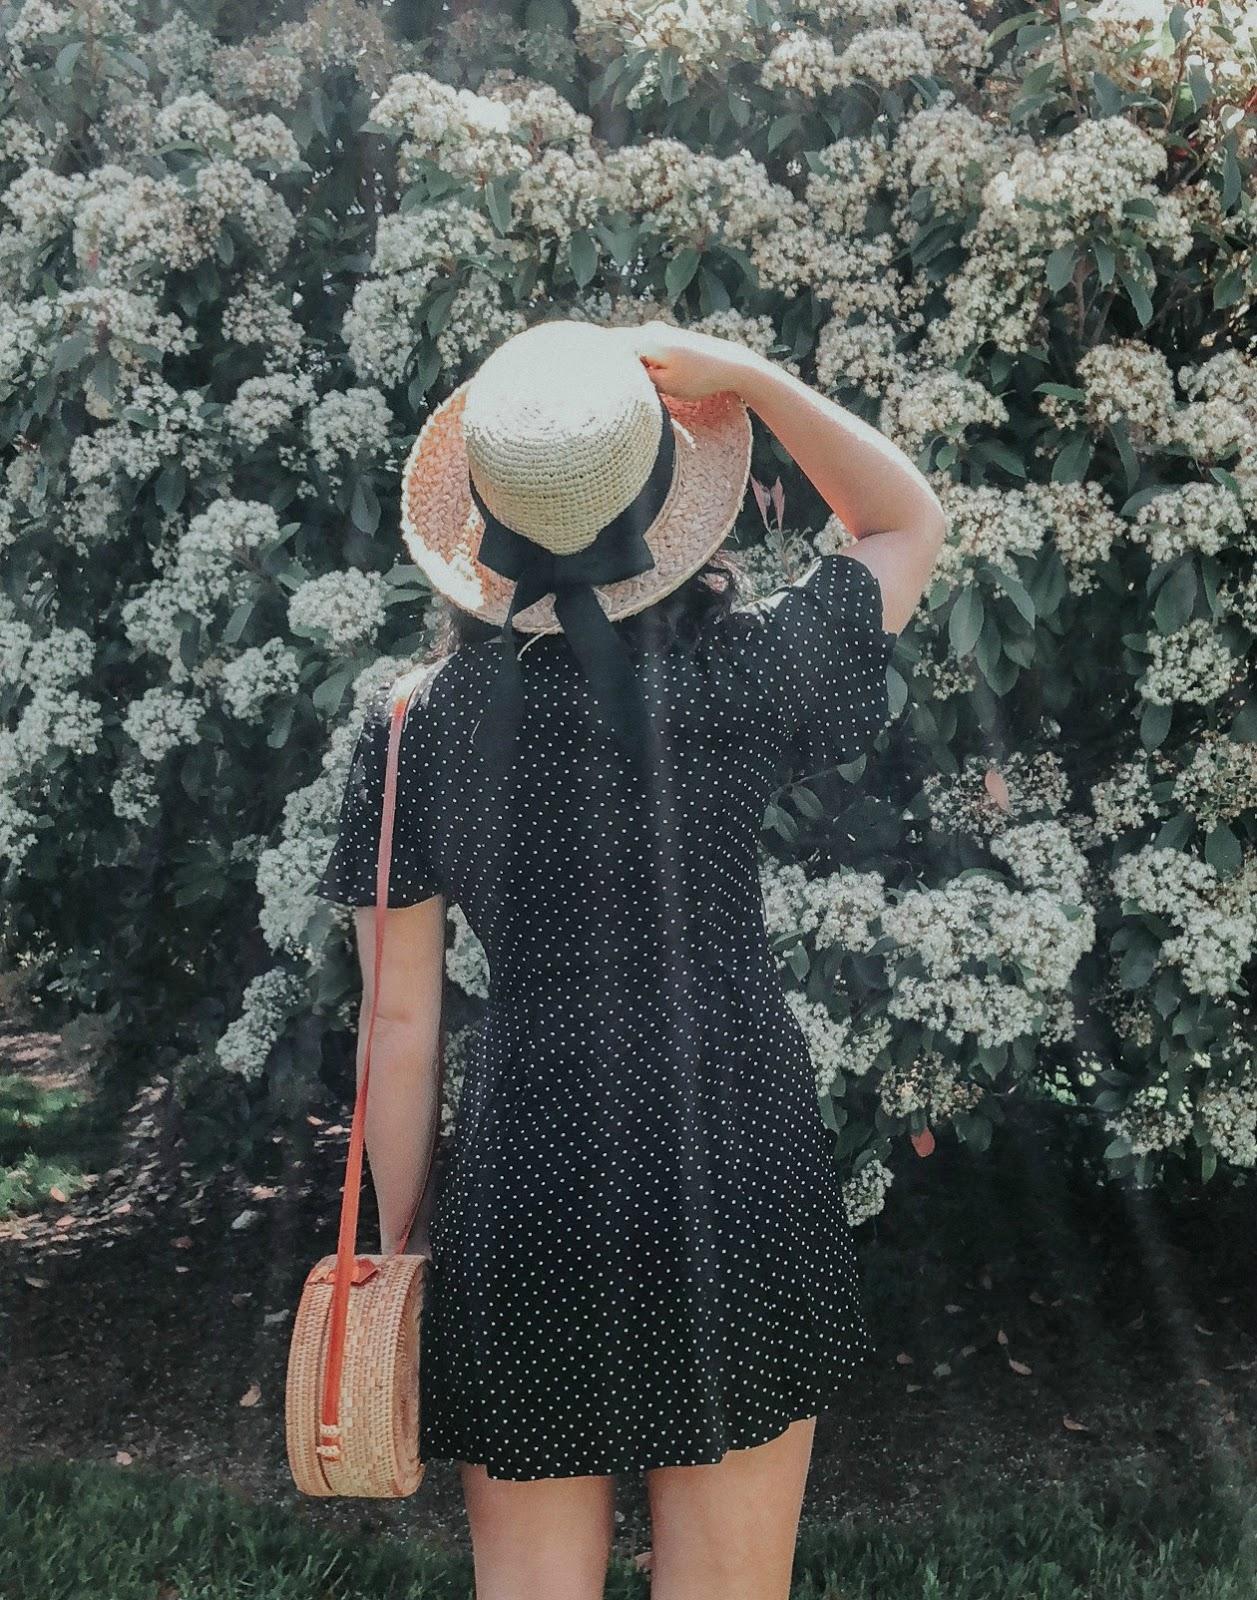 francesca's polka dot dress, french style, rattan bag, free people bag, xo samantha brooke, polka dot dress, ruffle sleeve dress, feminine fashion, life and messy hair, nc blogger, nc photographer